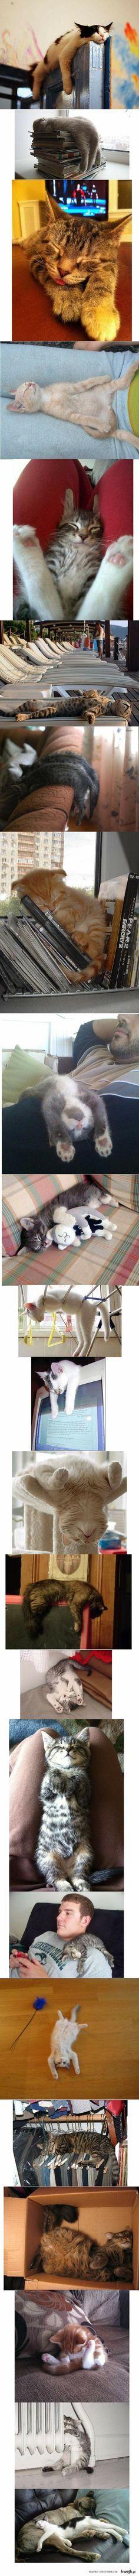 Cat naps - oh my!:)